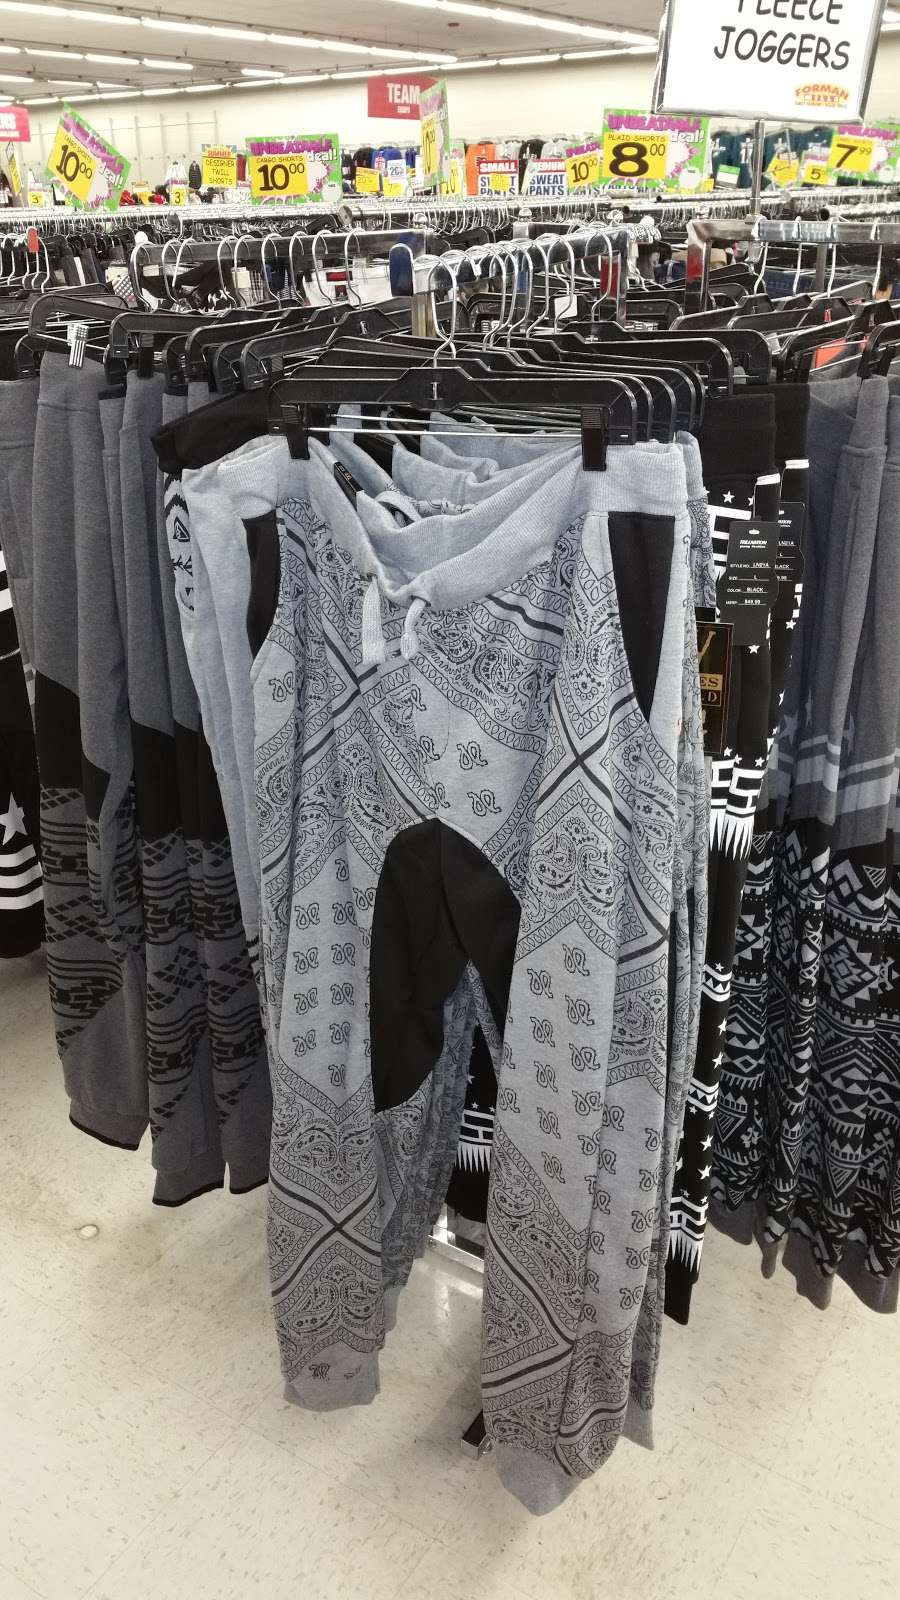 Forman Mills - clothing store  | Photo 5 of 10 | Address: 1140 Hurffville Rd, Woodbury, NJ 08096, USA | Phone: (856) 812-4894